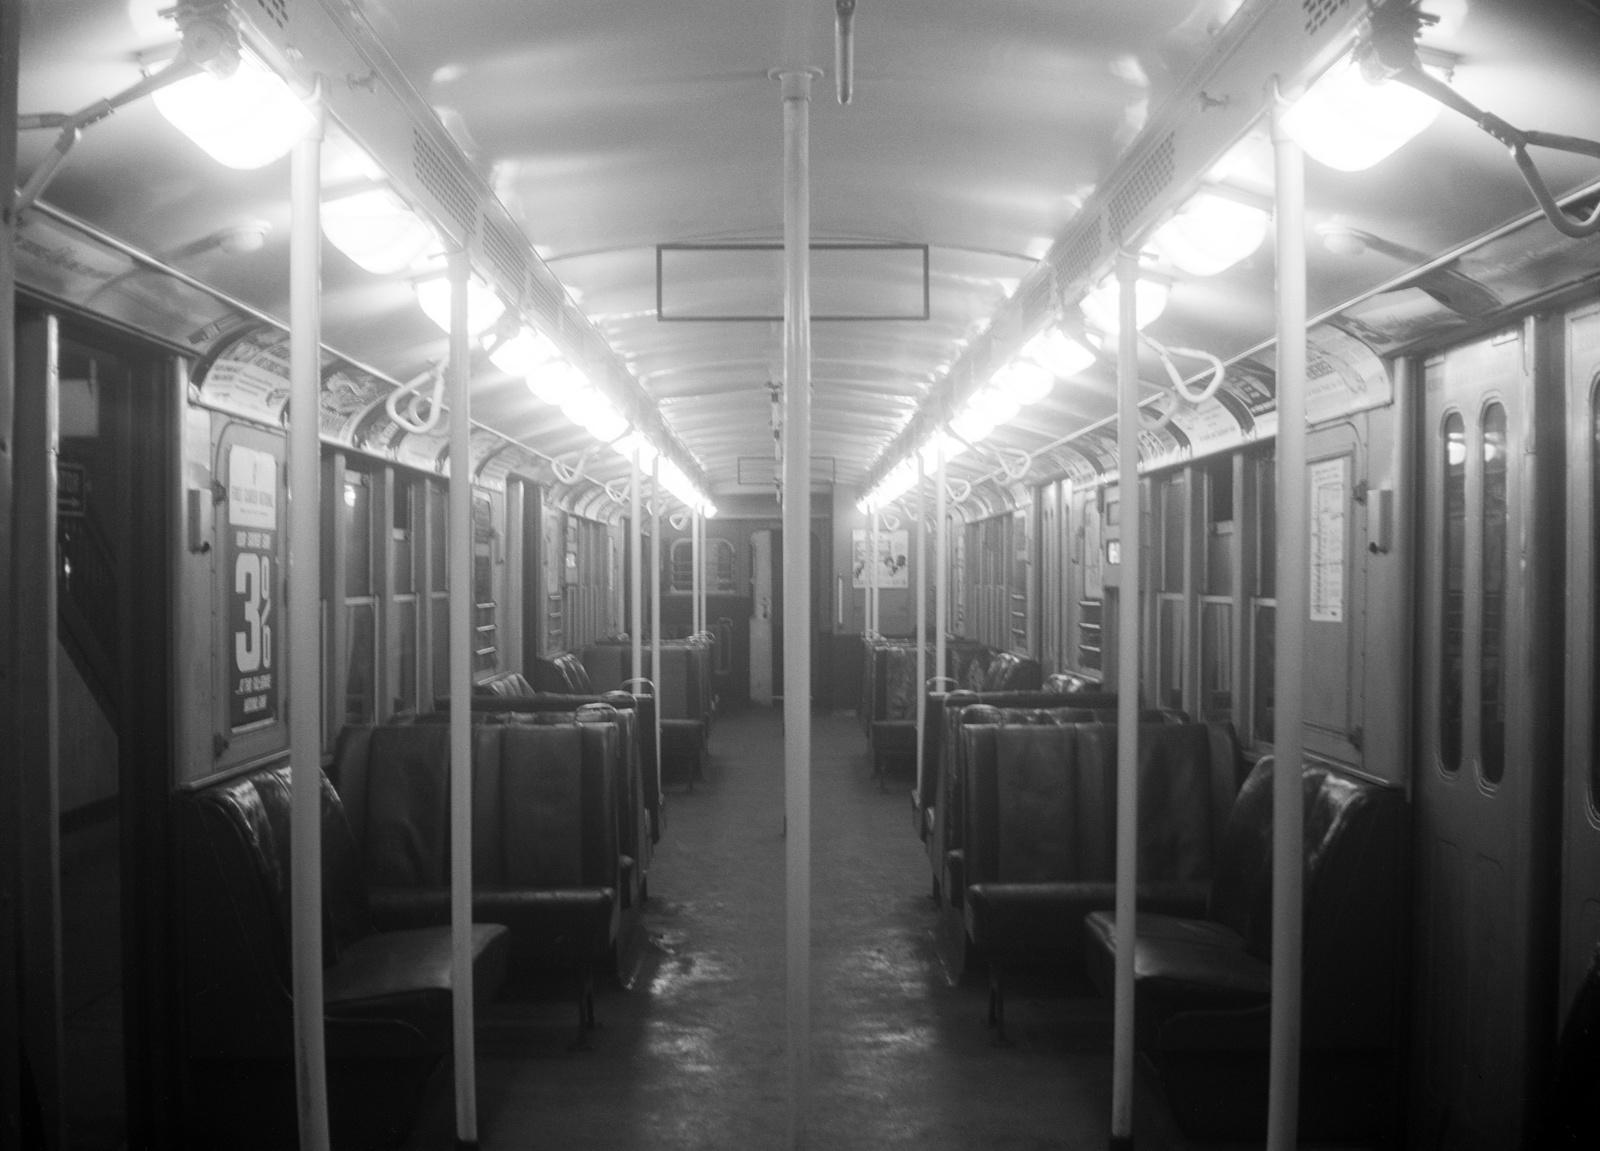 (429k, 1600x1151)<br><b>Country:</b> United States<br><b>City:</b> Philadelphia, PA<br><b>System:</b> SEPTA (or Predecessor)<br><b>Line:</b> Broad Street Subway<br><b>Location:</b> Broad Street Subway-Rolling Stock Interiors<br><b>Car:</b> PTC/SEPTA B-2 DRPA Bridge Line (J.G. Brill, 1936) 1025 <br><b>Collection of:</b> David Pirmann<br><b>Date:</b> 10/15/1962<br><b>Viewed (this week/total):</b> 0 / 123